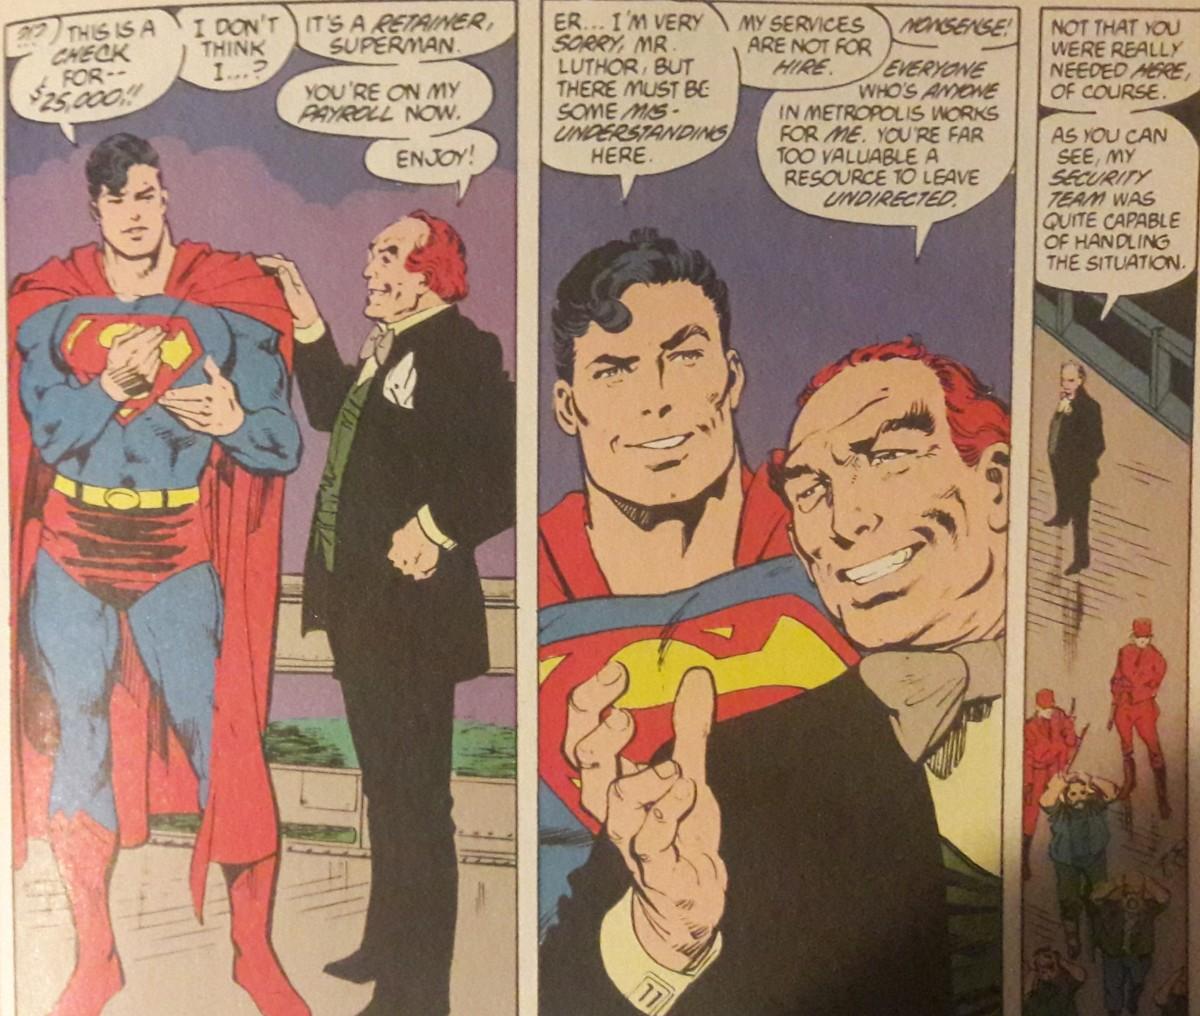 Lex Luthor, always willing toupee